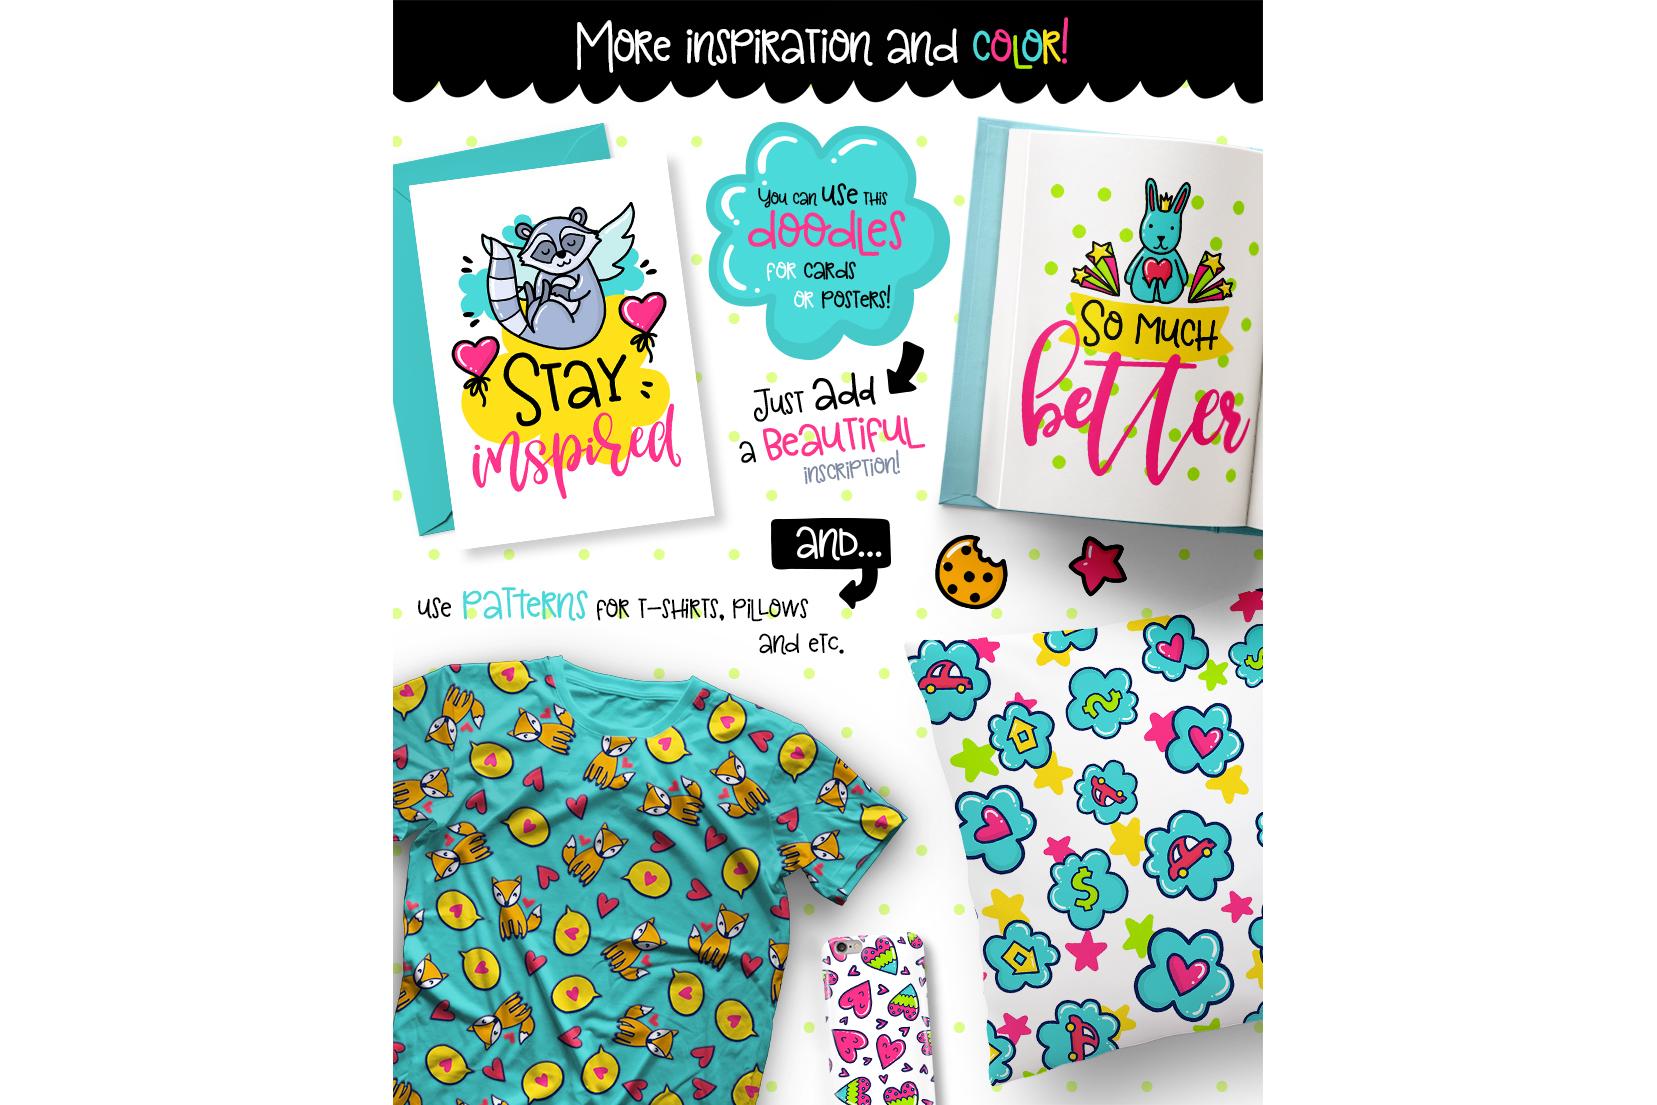 700 Doodles & Patterns - Clipart Set example image 5